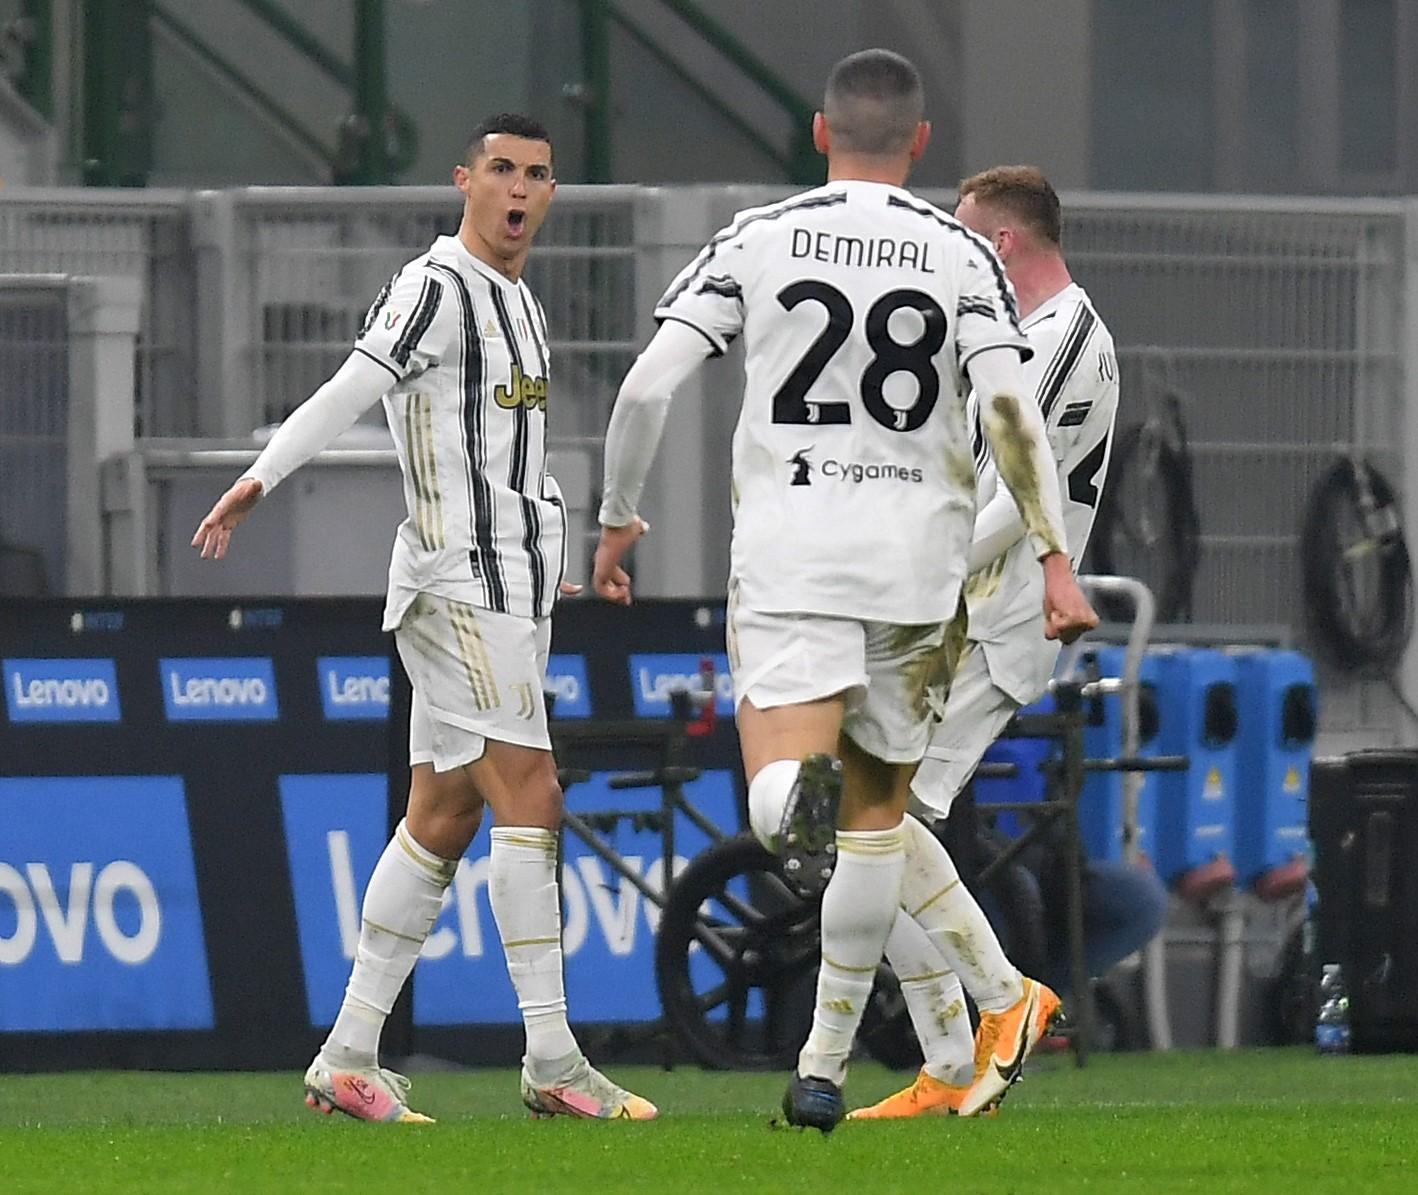 ITALY-MILAN-FOOTBALL-ITALY CUP-INTER VS JUVENTUS